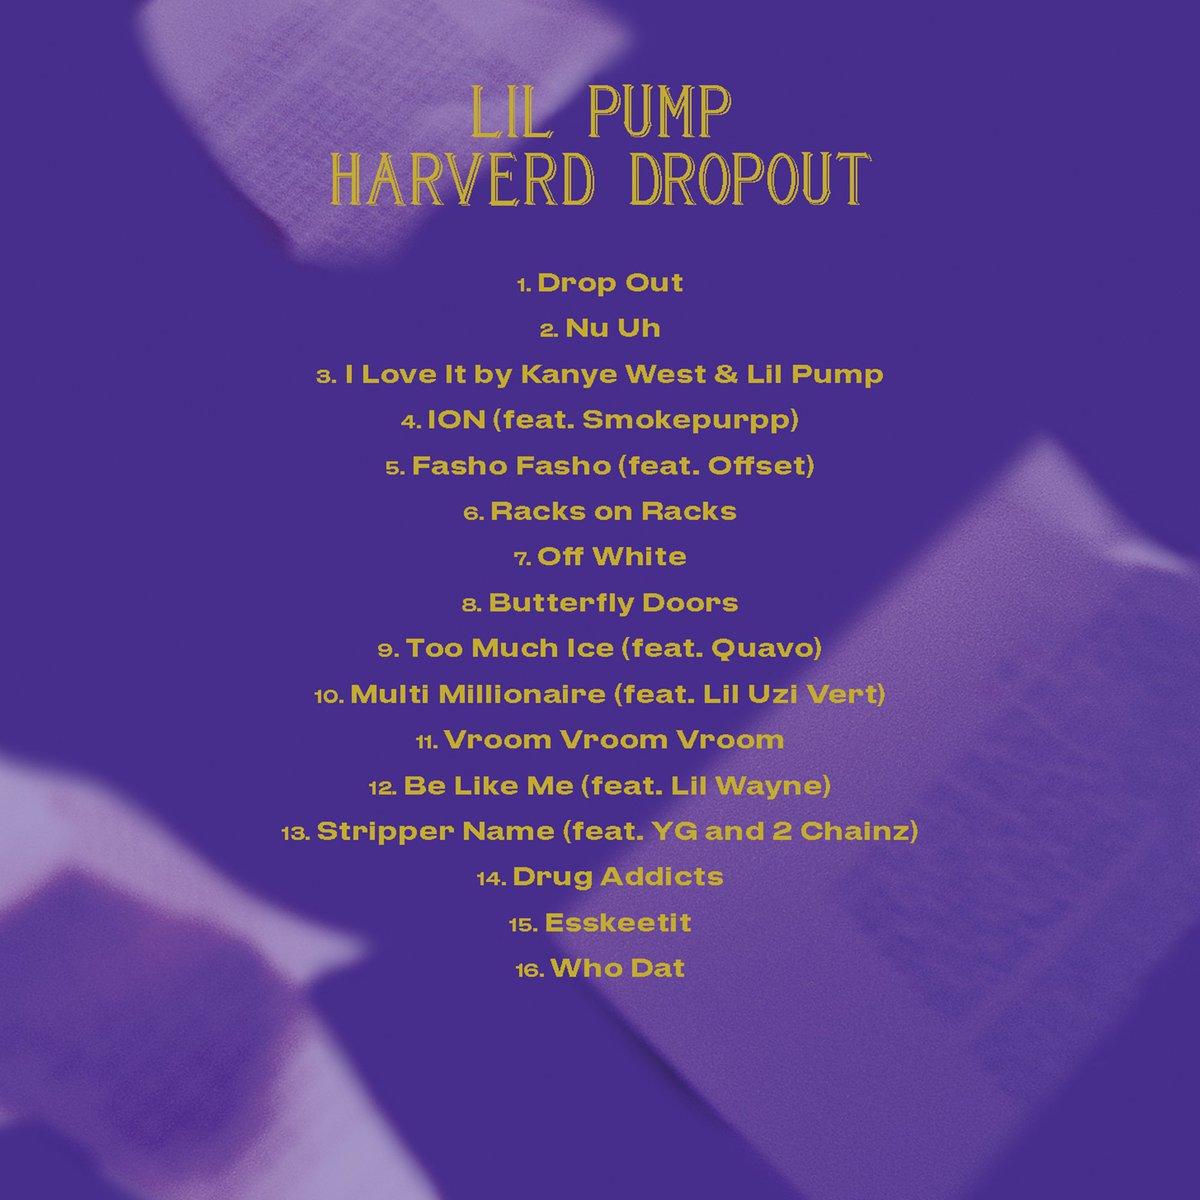 Image result for lil pump harvard dropout tracklist